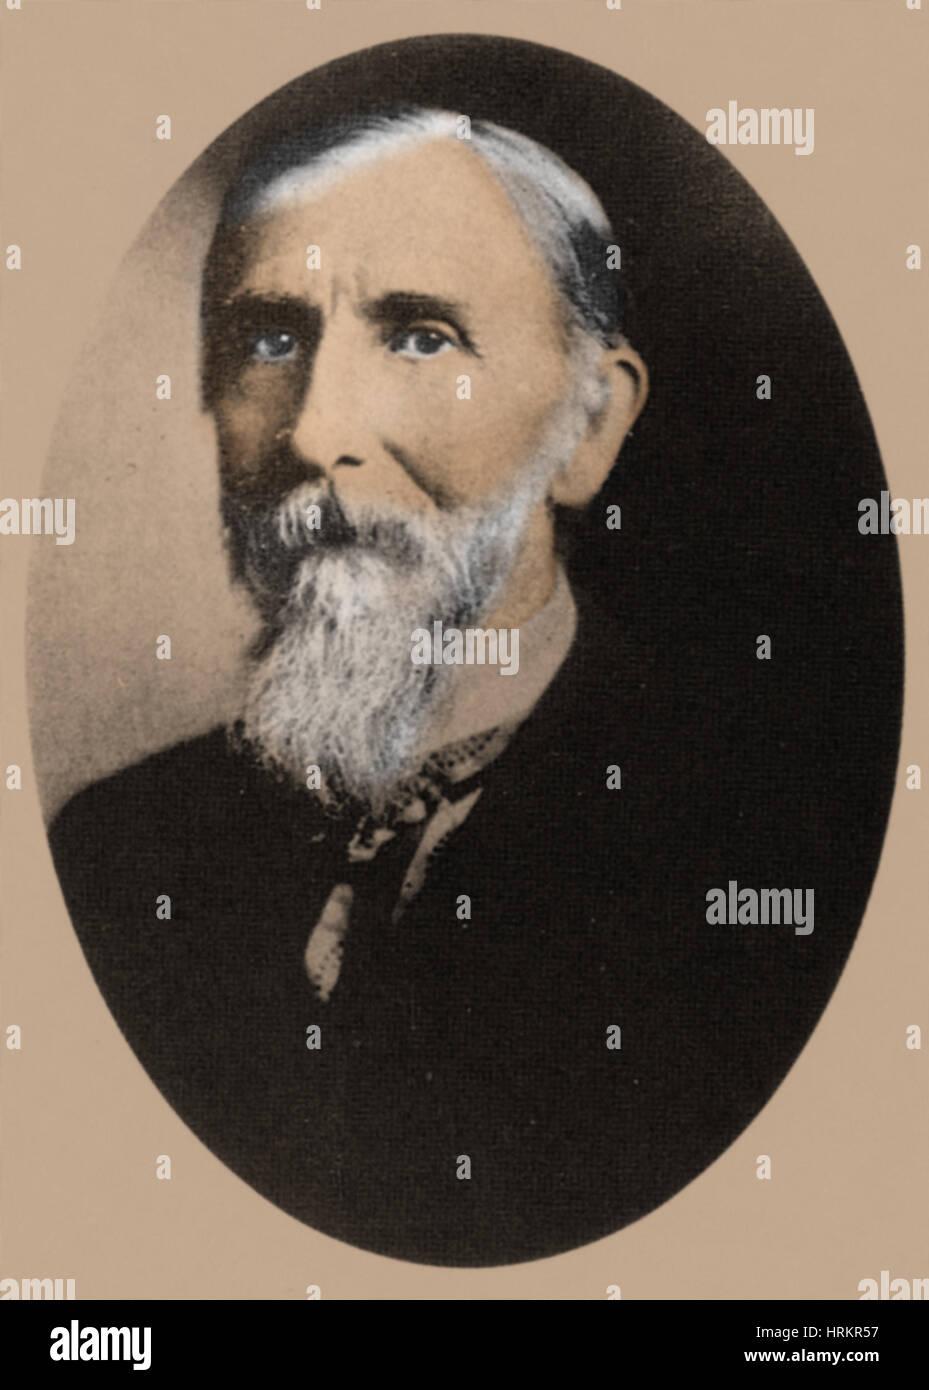 Milton Bradley, American Inventor - Stock Image